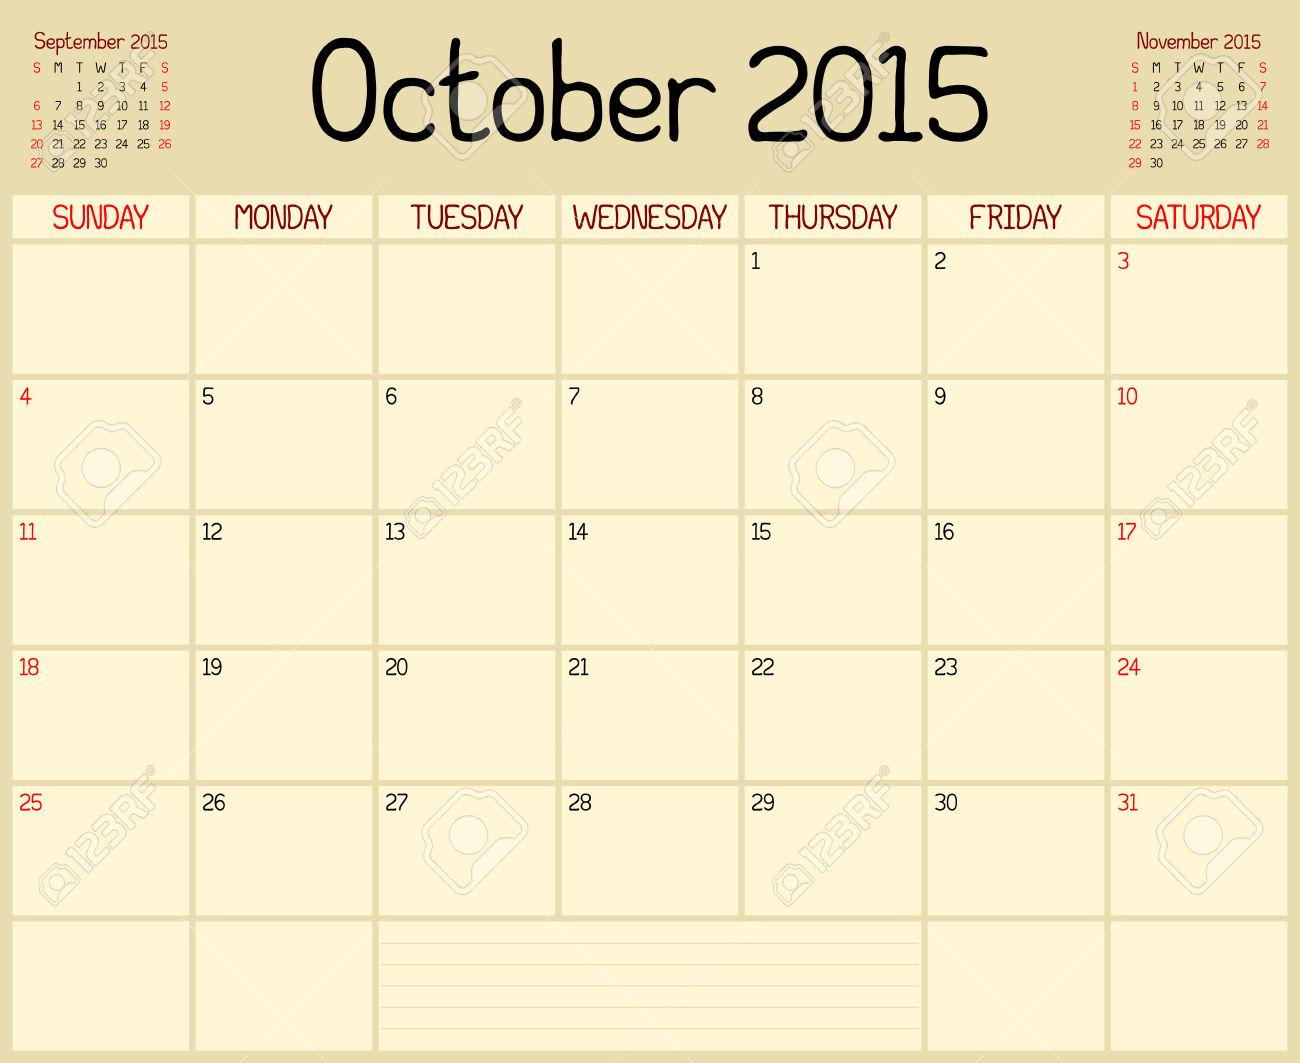 October 2015 calendar clipart freeuse stock October 2015 Calendar Clip Art – 2017 printable calendar freeuse stock